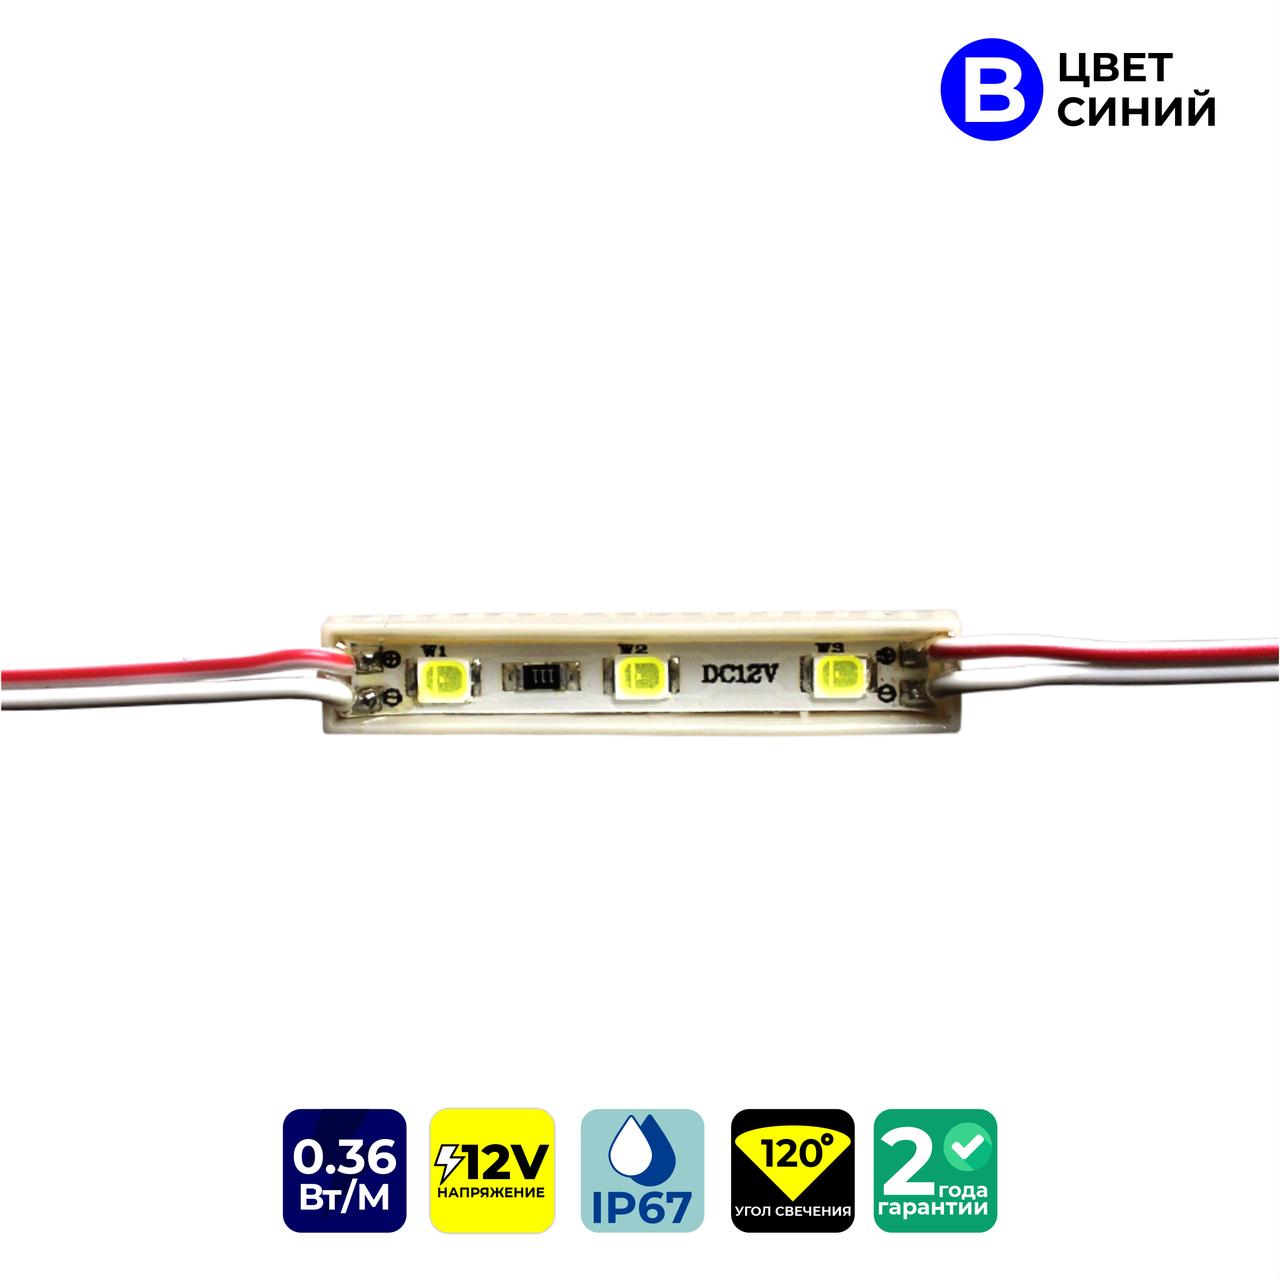 Светодиодные модули FT0839B3SMD2835 (IP67) 0,36W, цвет - синий